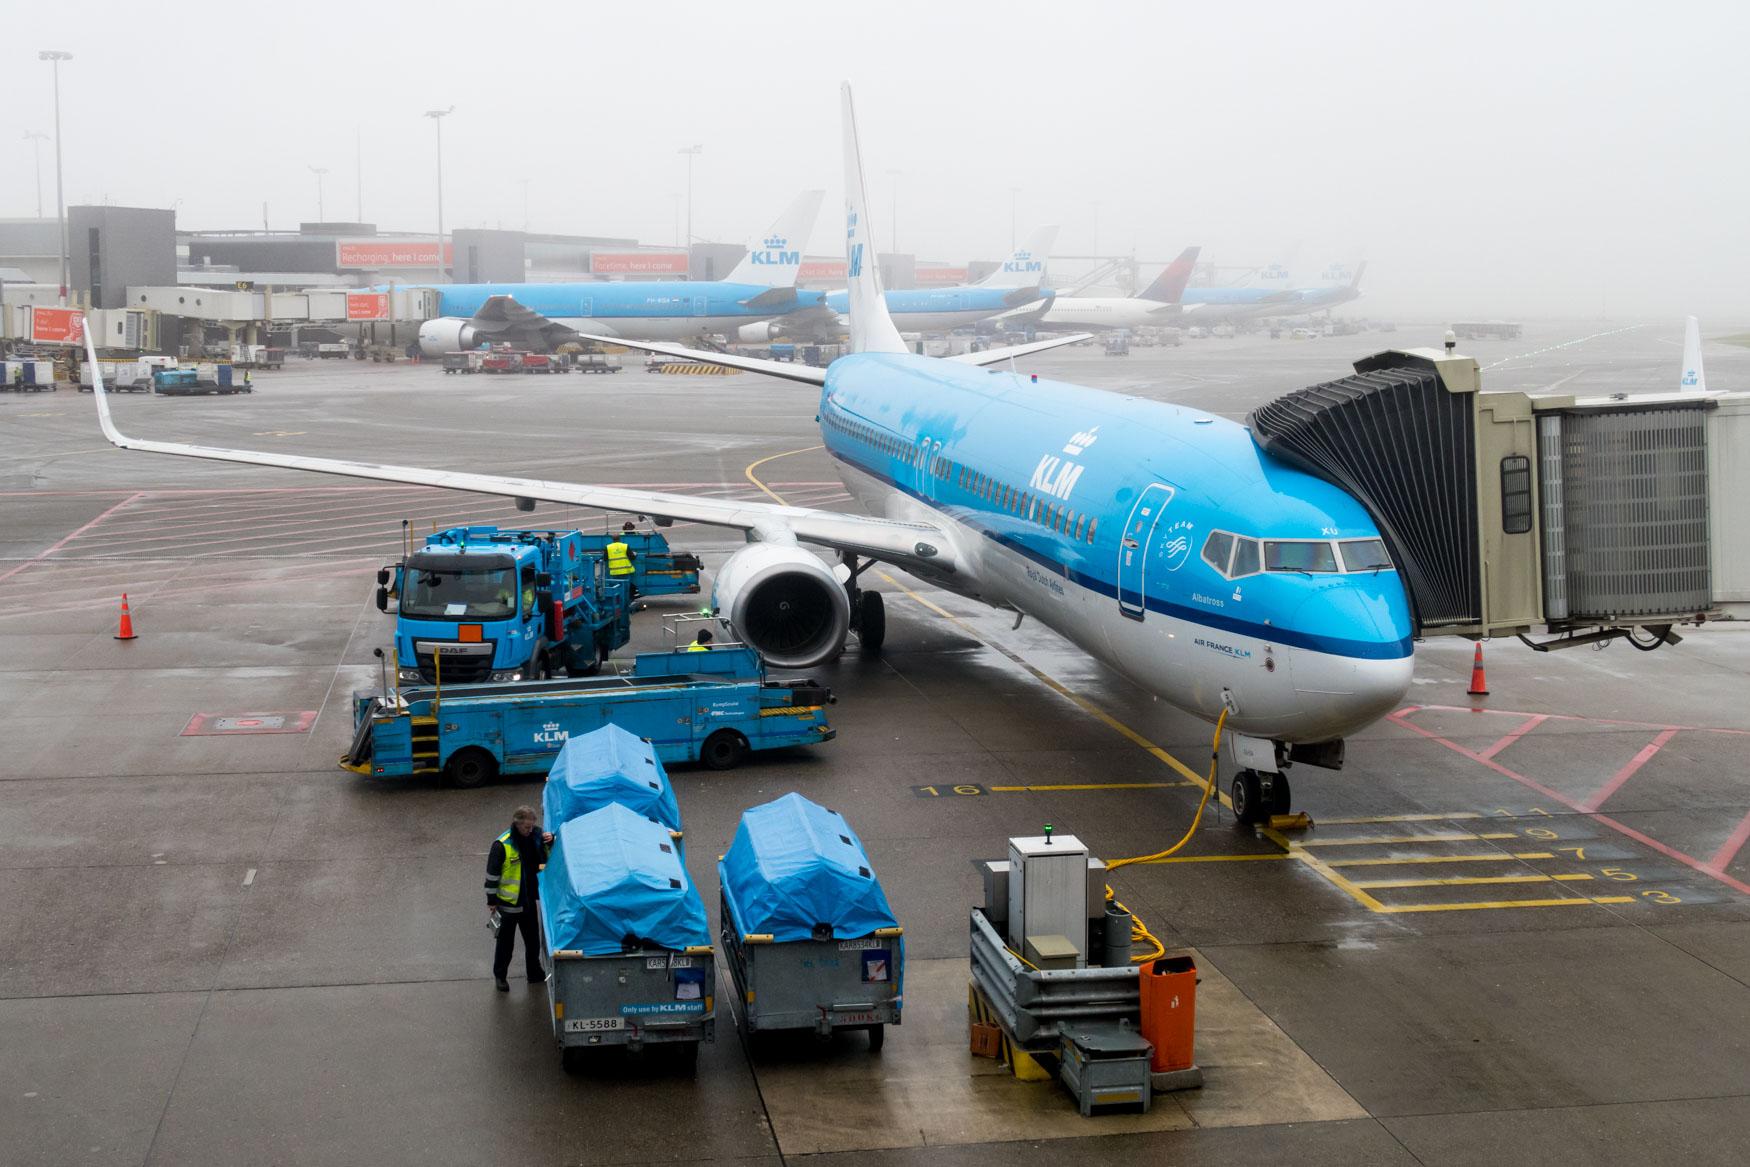 KLM Boeing 737-800 at Amsterdam Schiphol